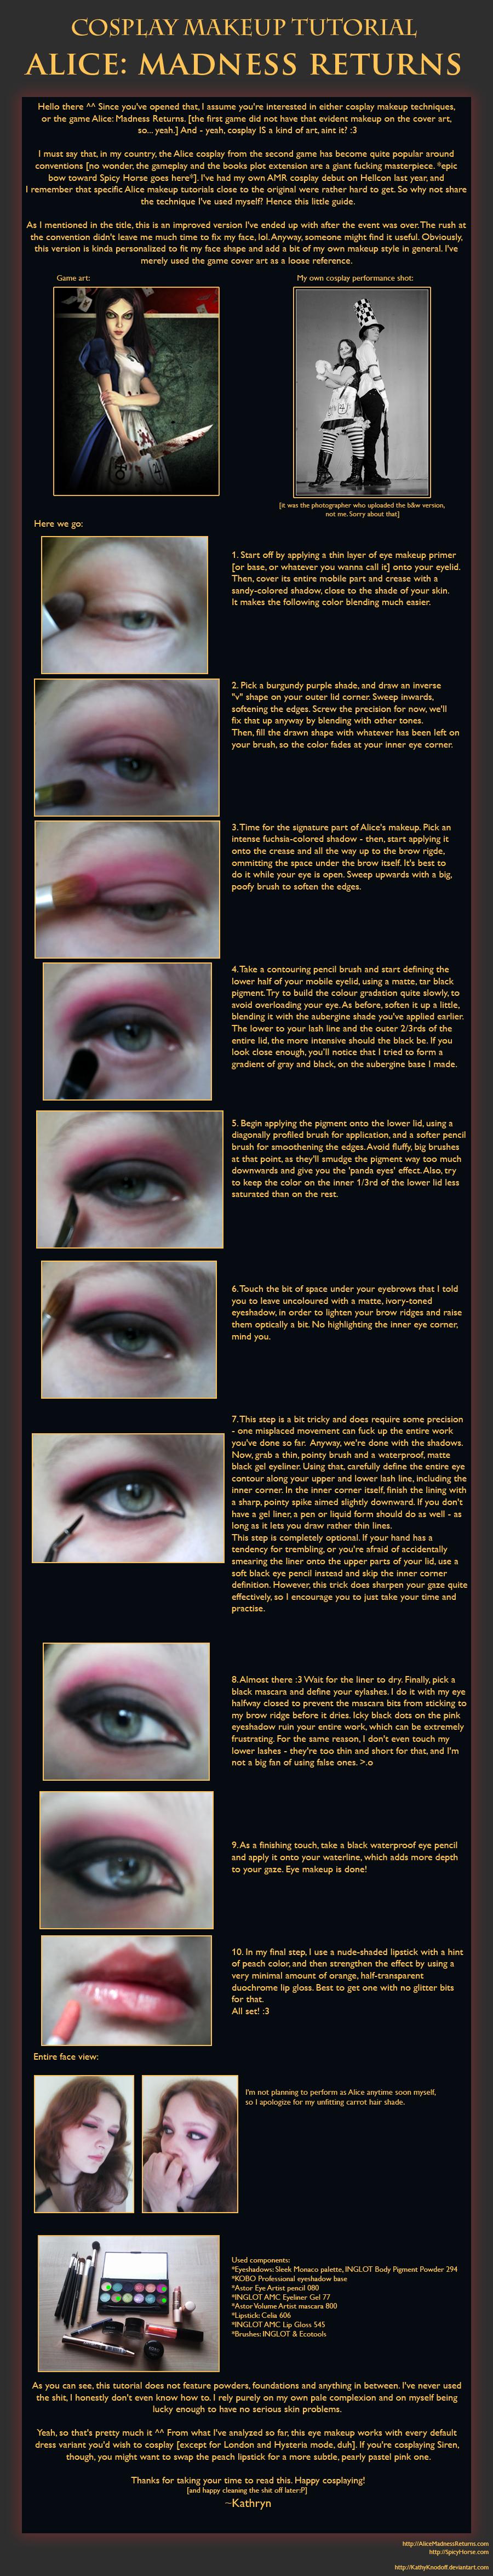 Cosplay makeup tutorial alice liddell improved by kathyknodoff on cosplay makeup tutorial alice liddell improved by kathyknodoff baditri Gallery